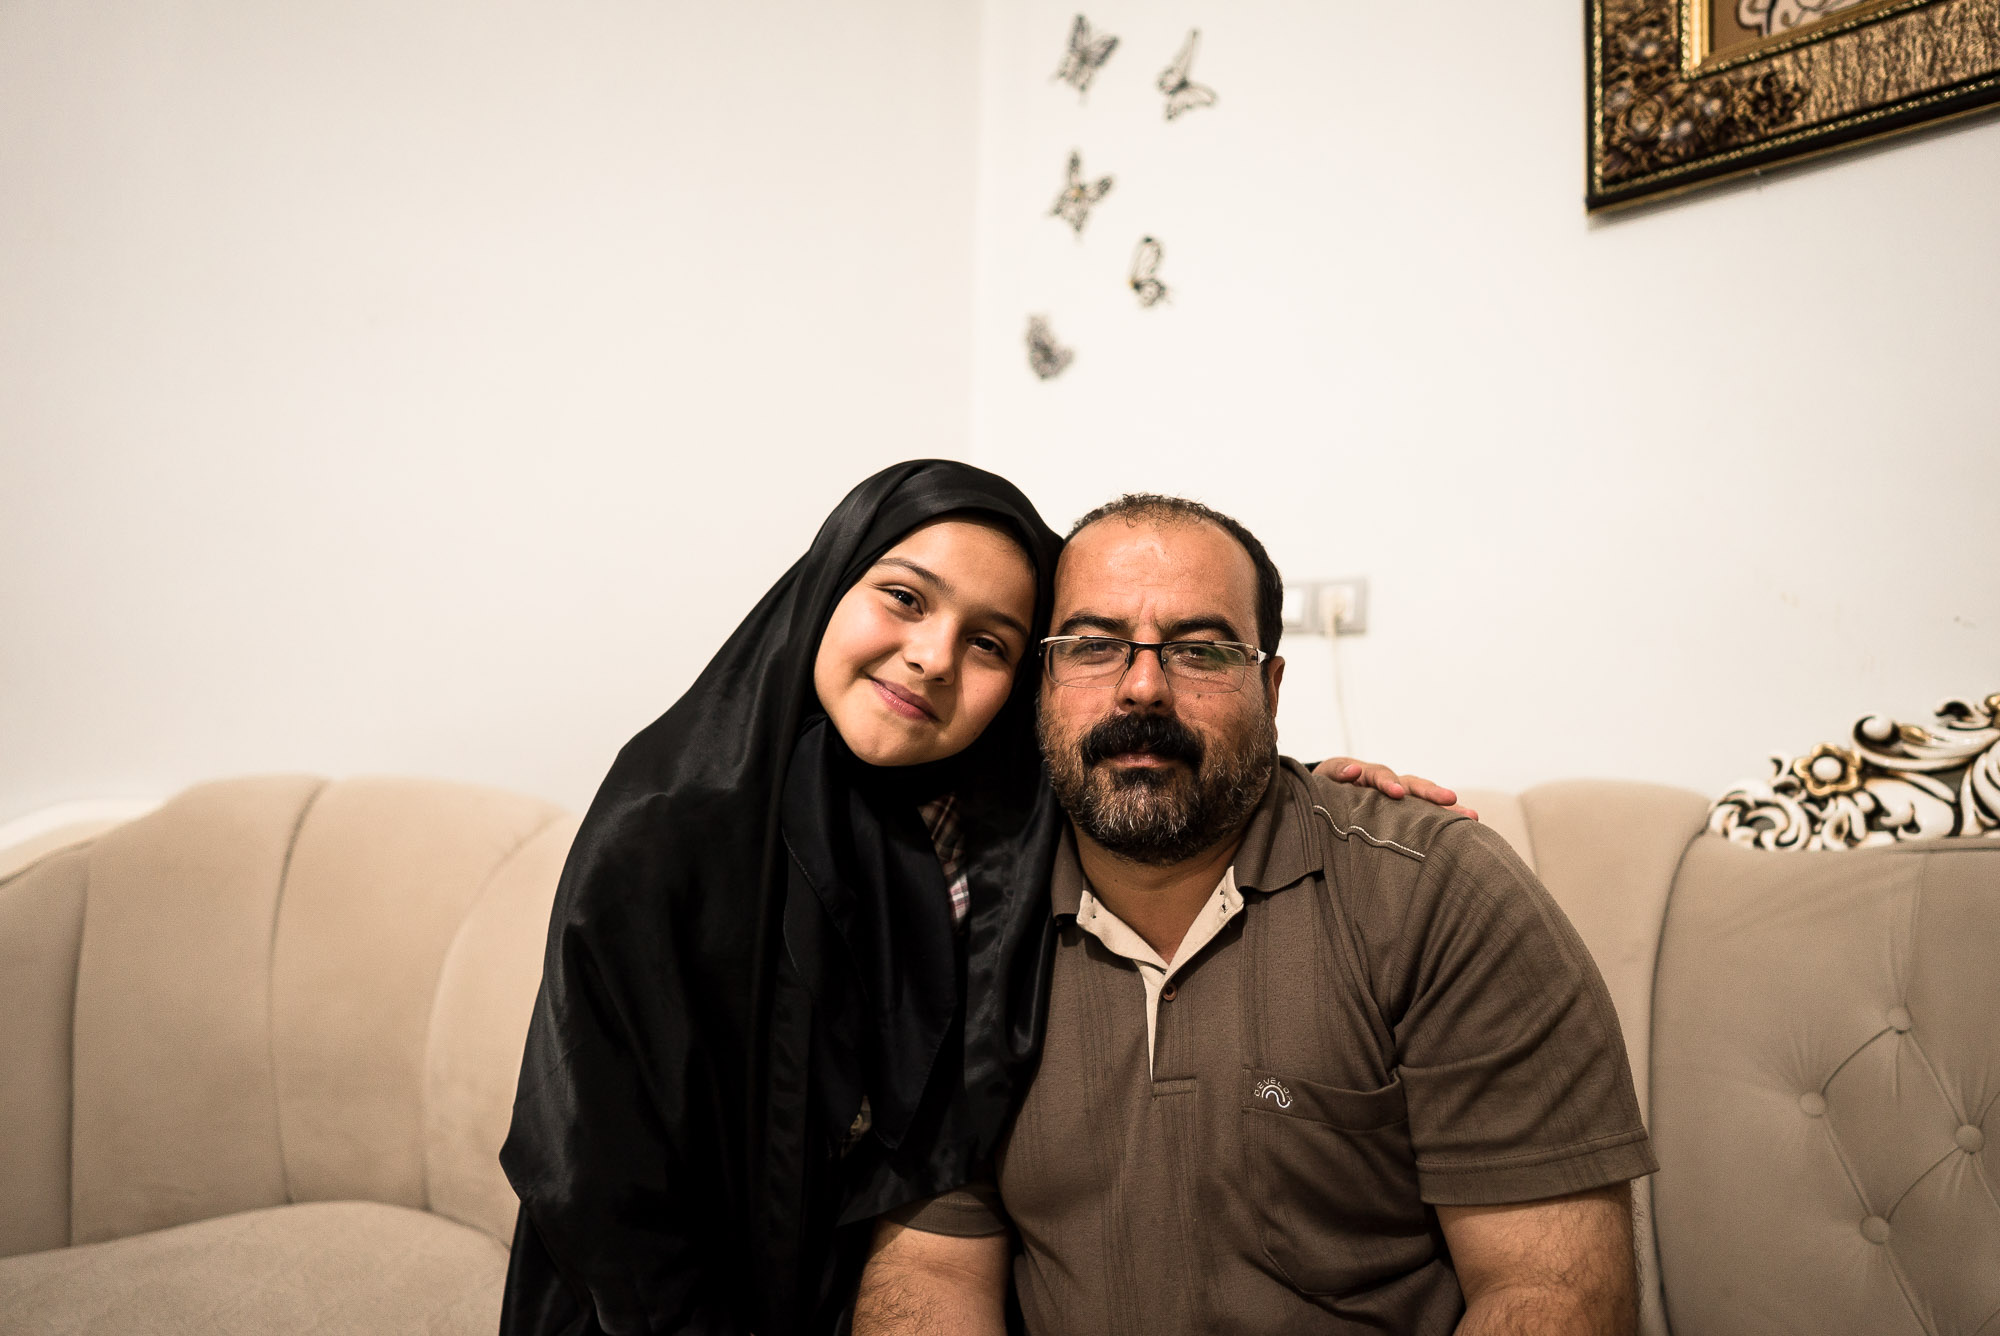 Hassan and Mahdiye